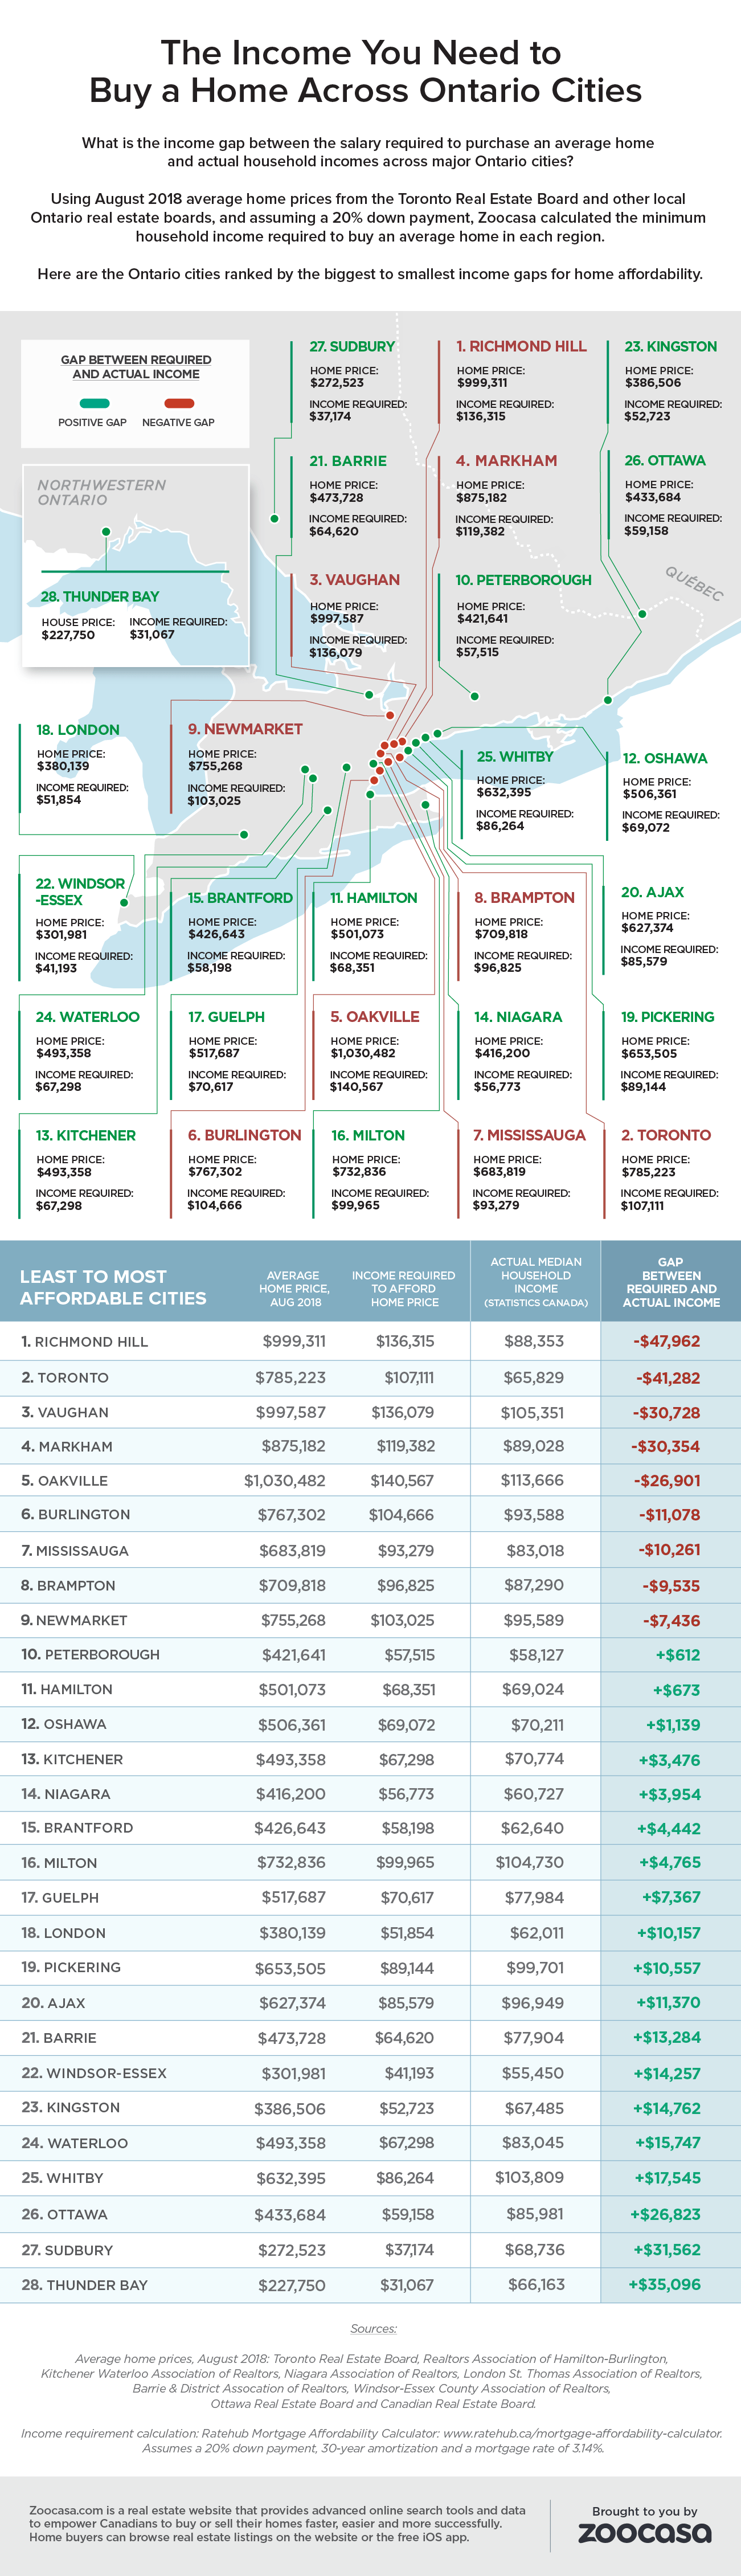 ontario-home-affordability-income-gap-zoocasa